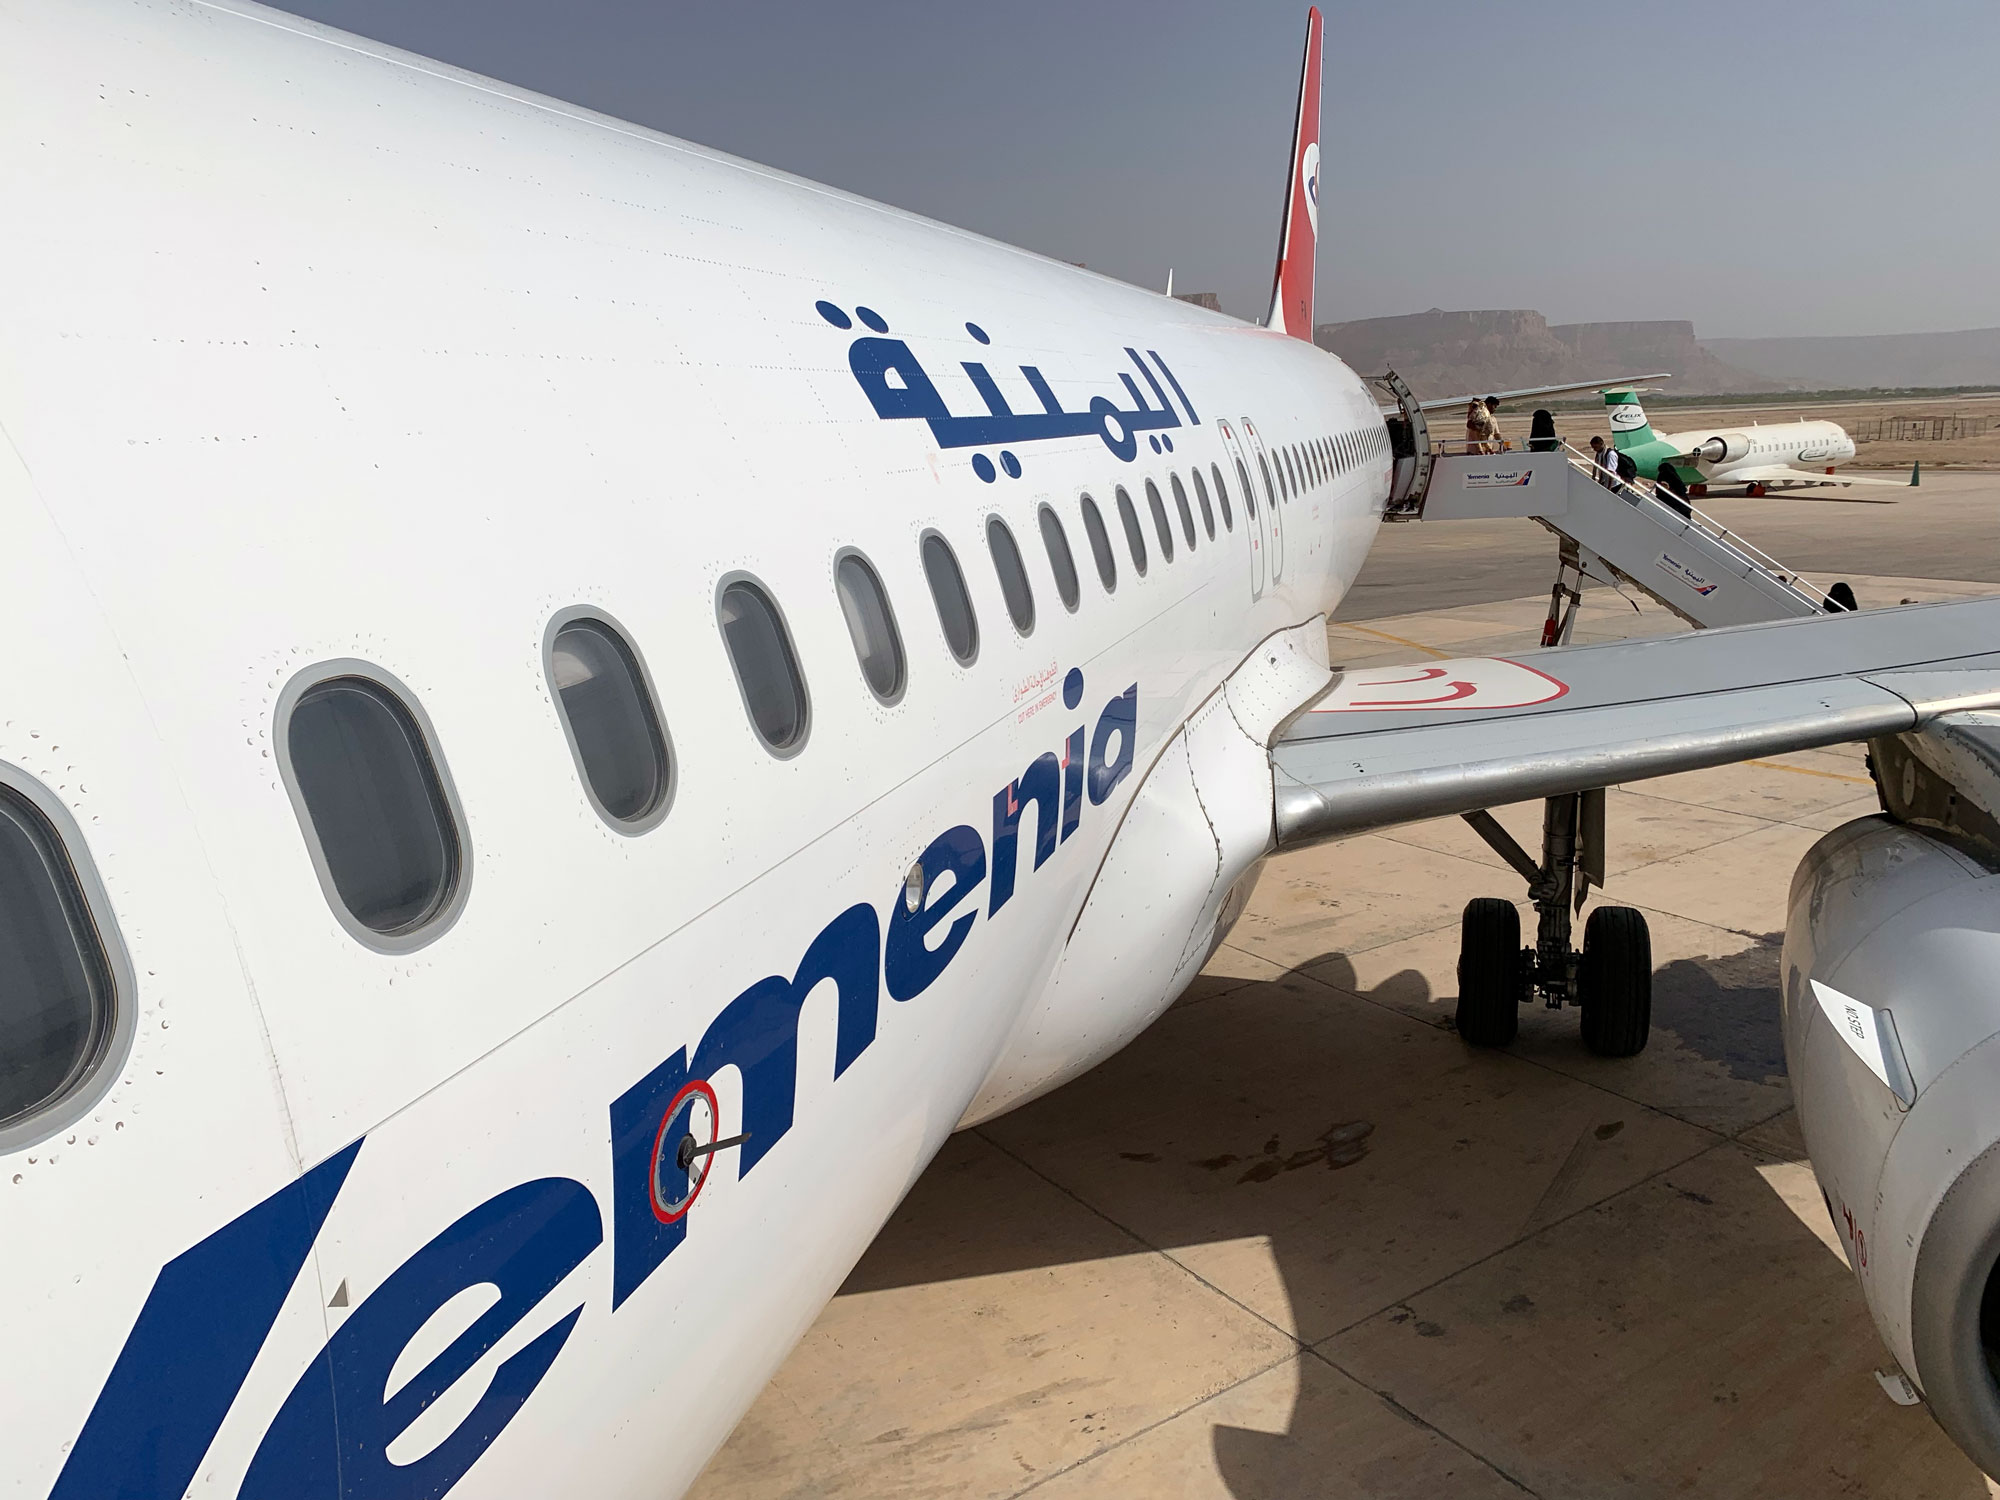 Boarding the Yemenia flight to Socotra in Seiyun Airport.